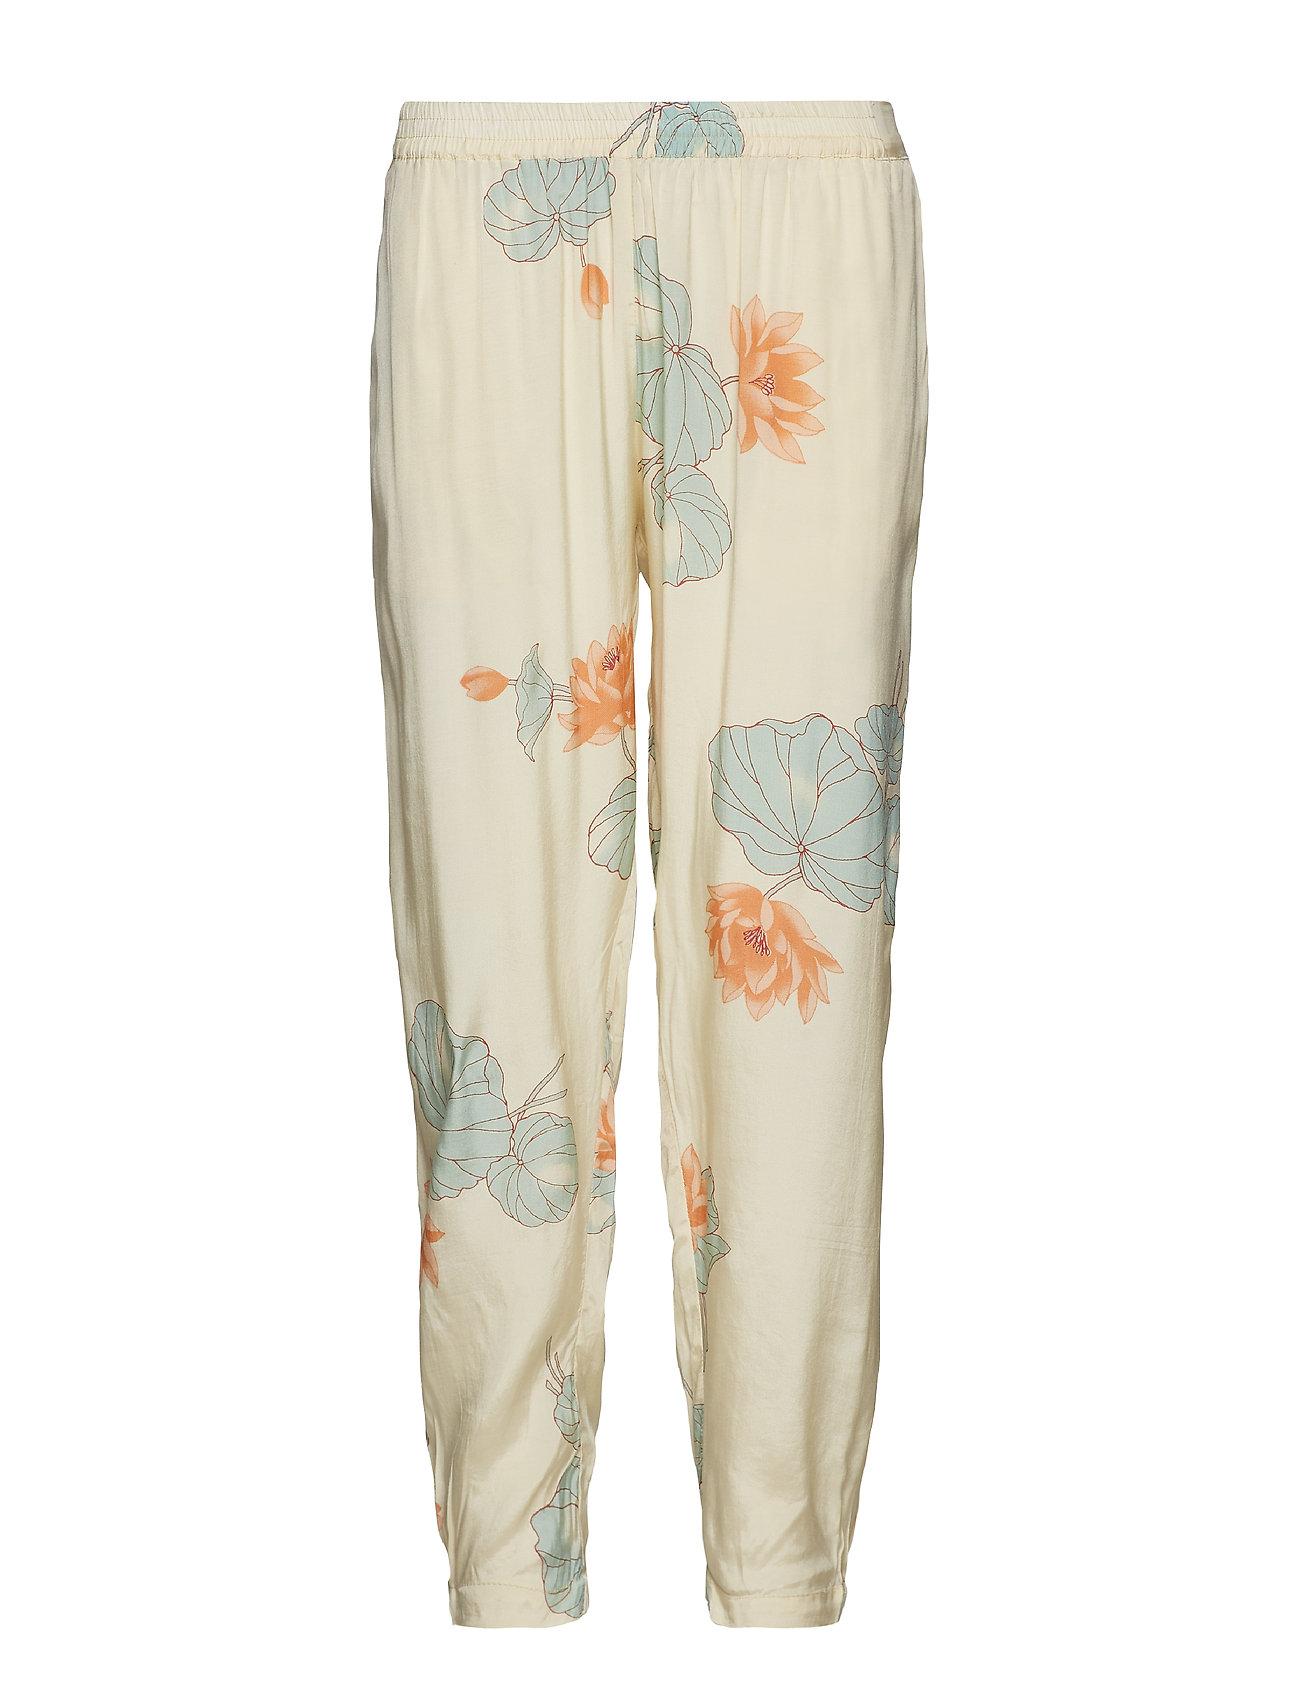 Rabens Saloner Lotus pants - BUTTERMILK